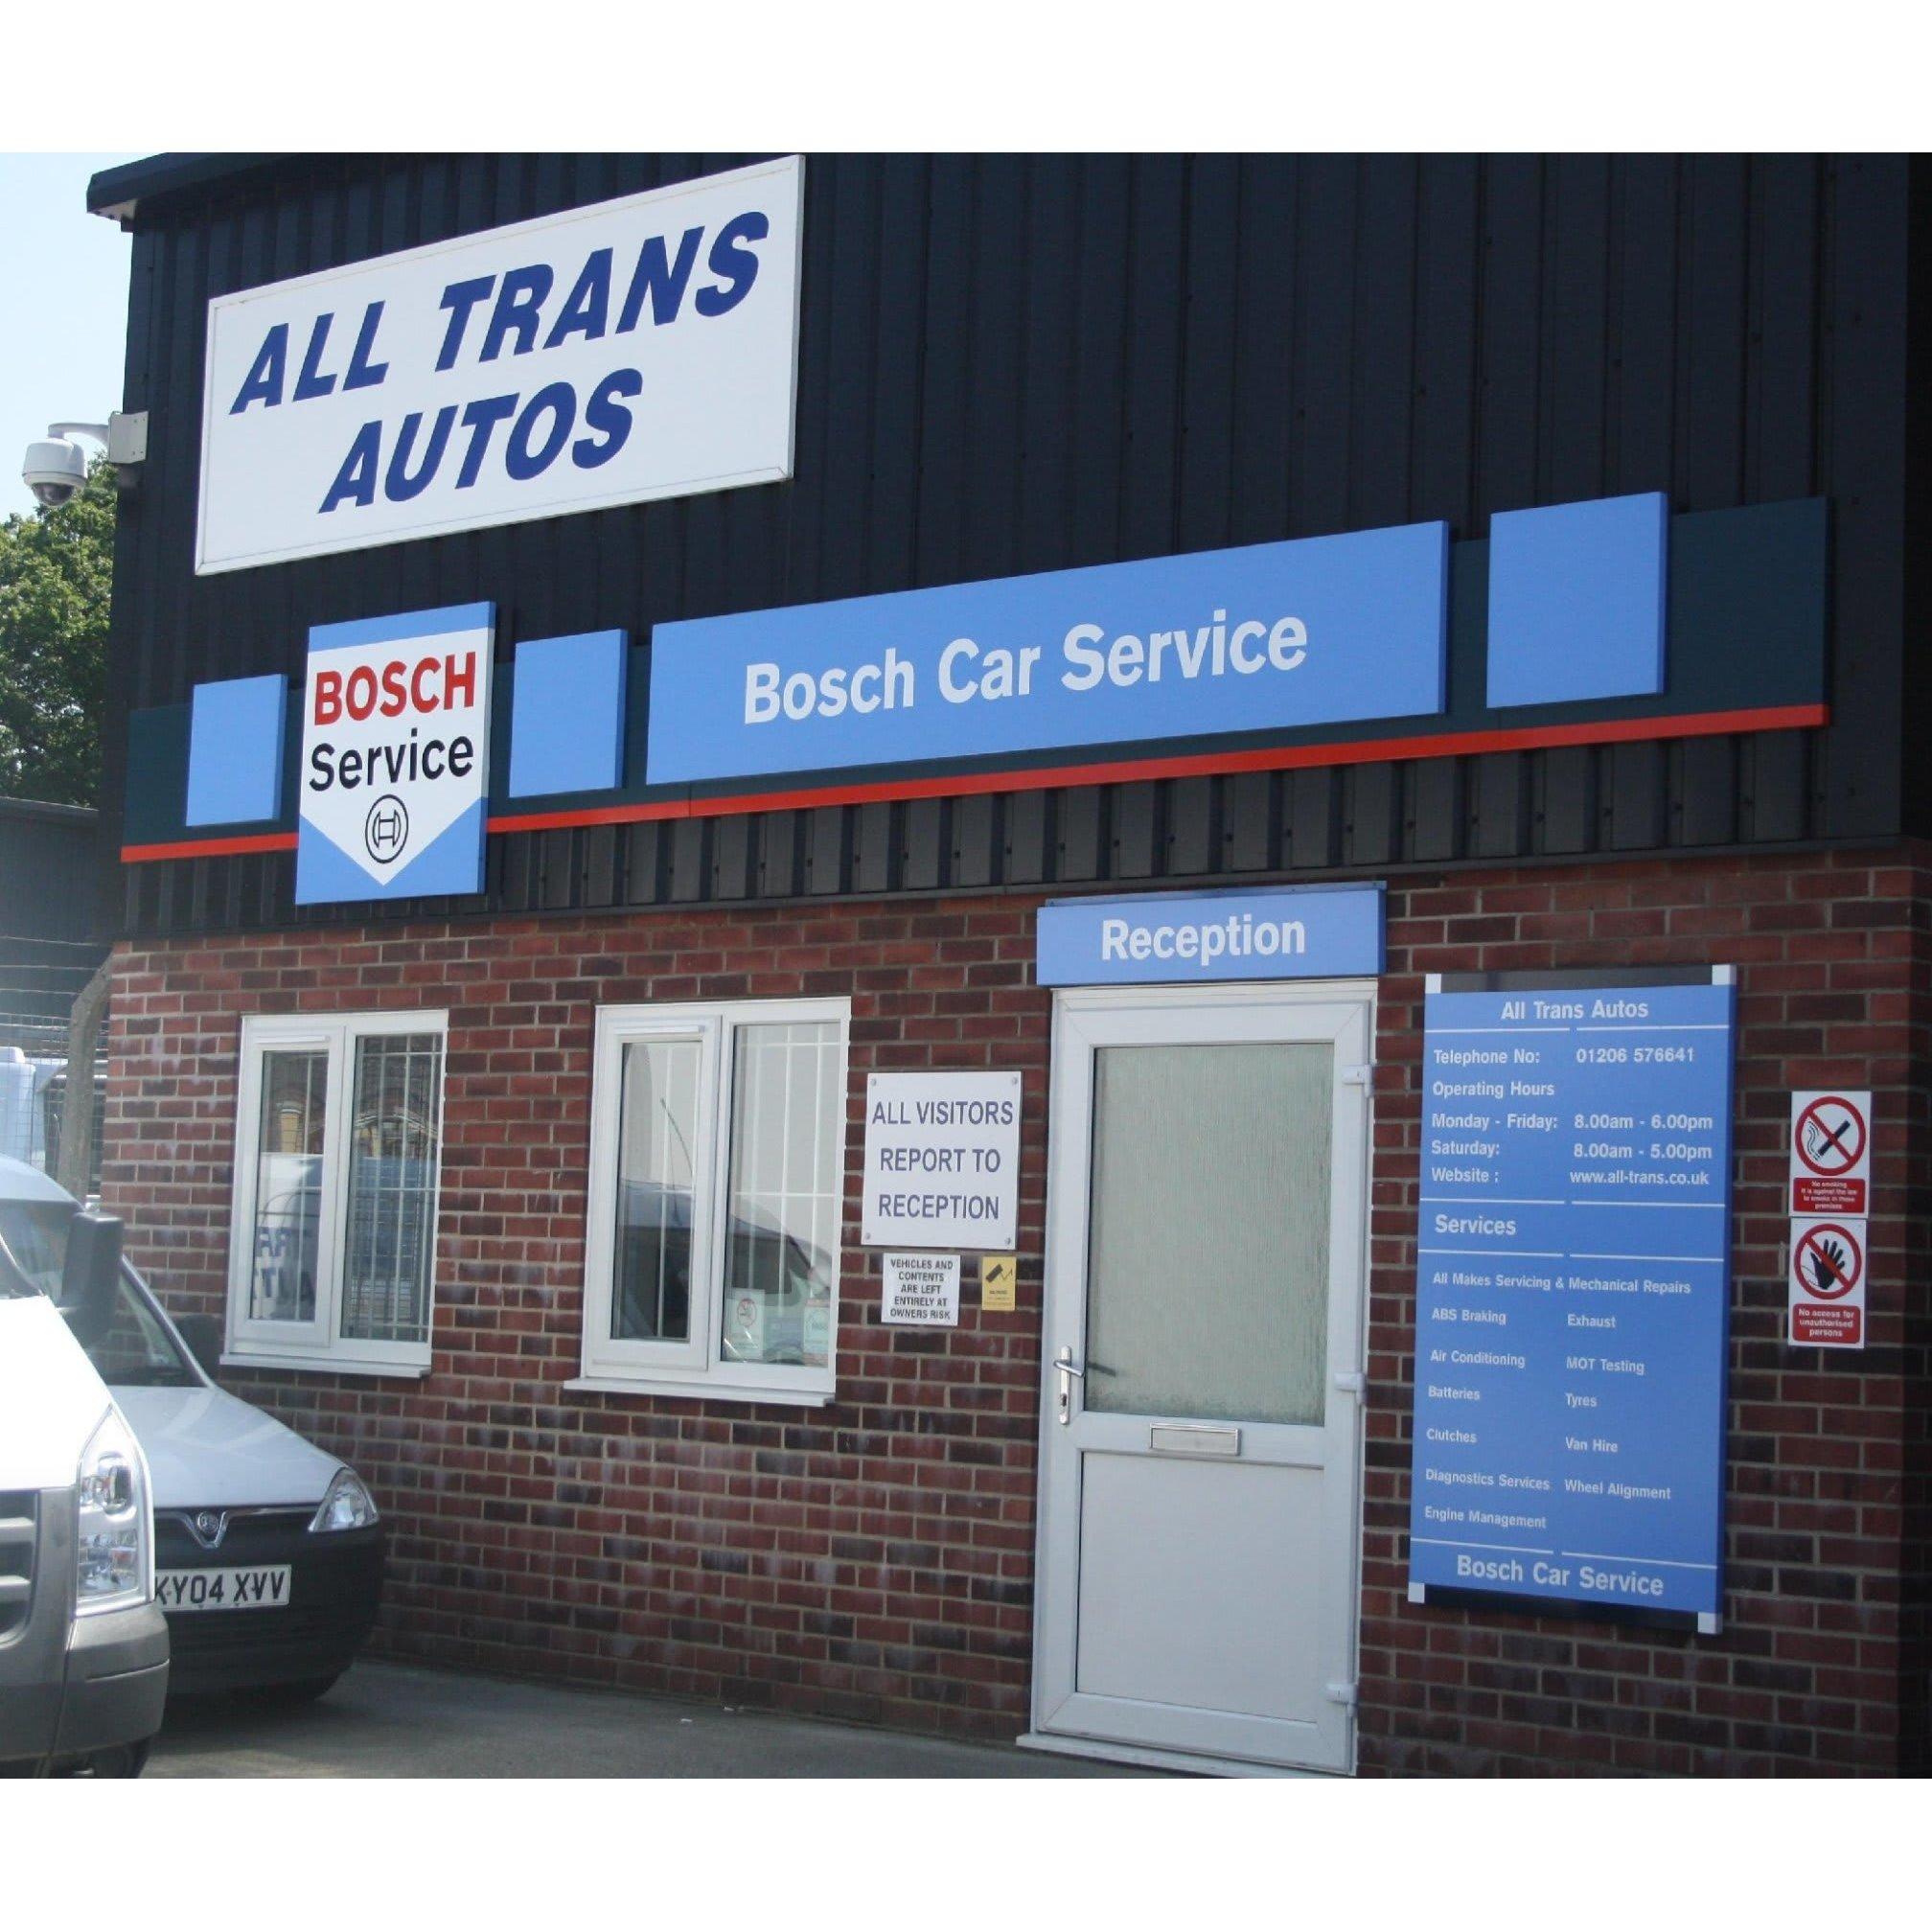 All Trans Autos Ltd